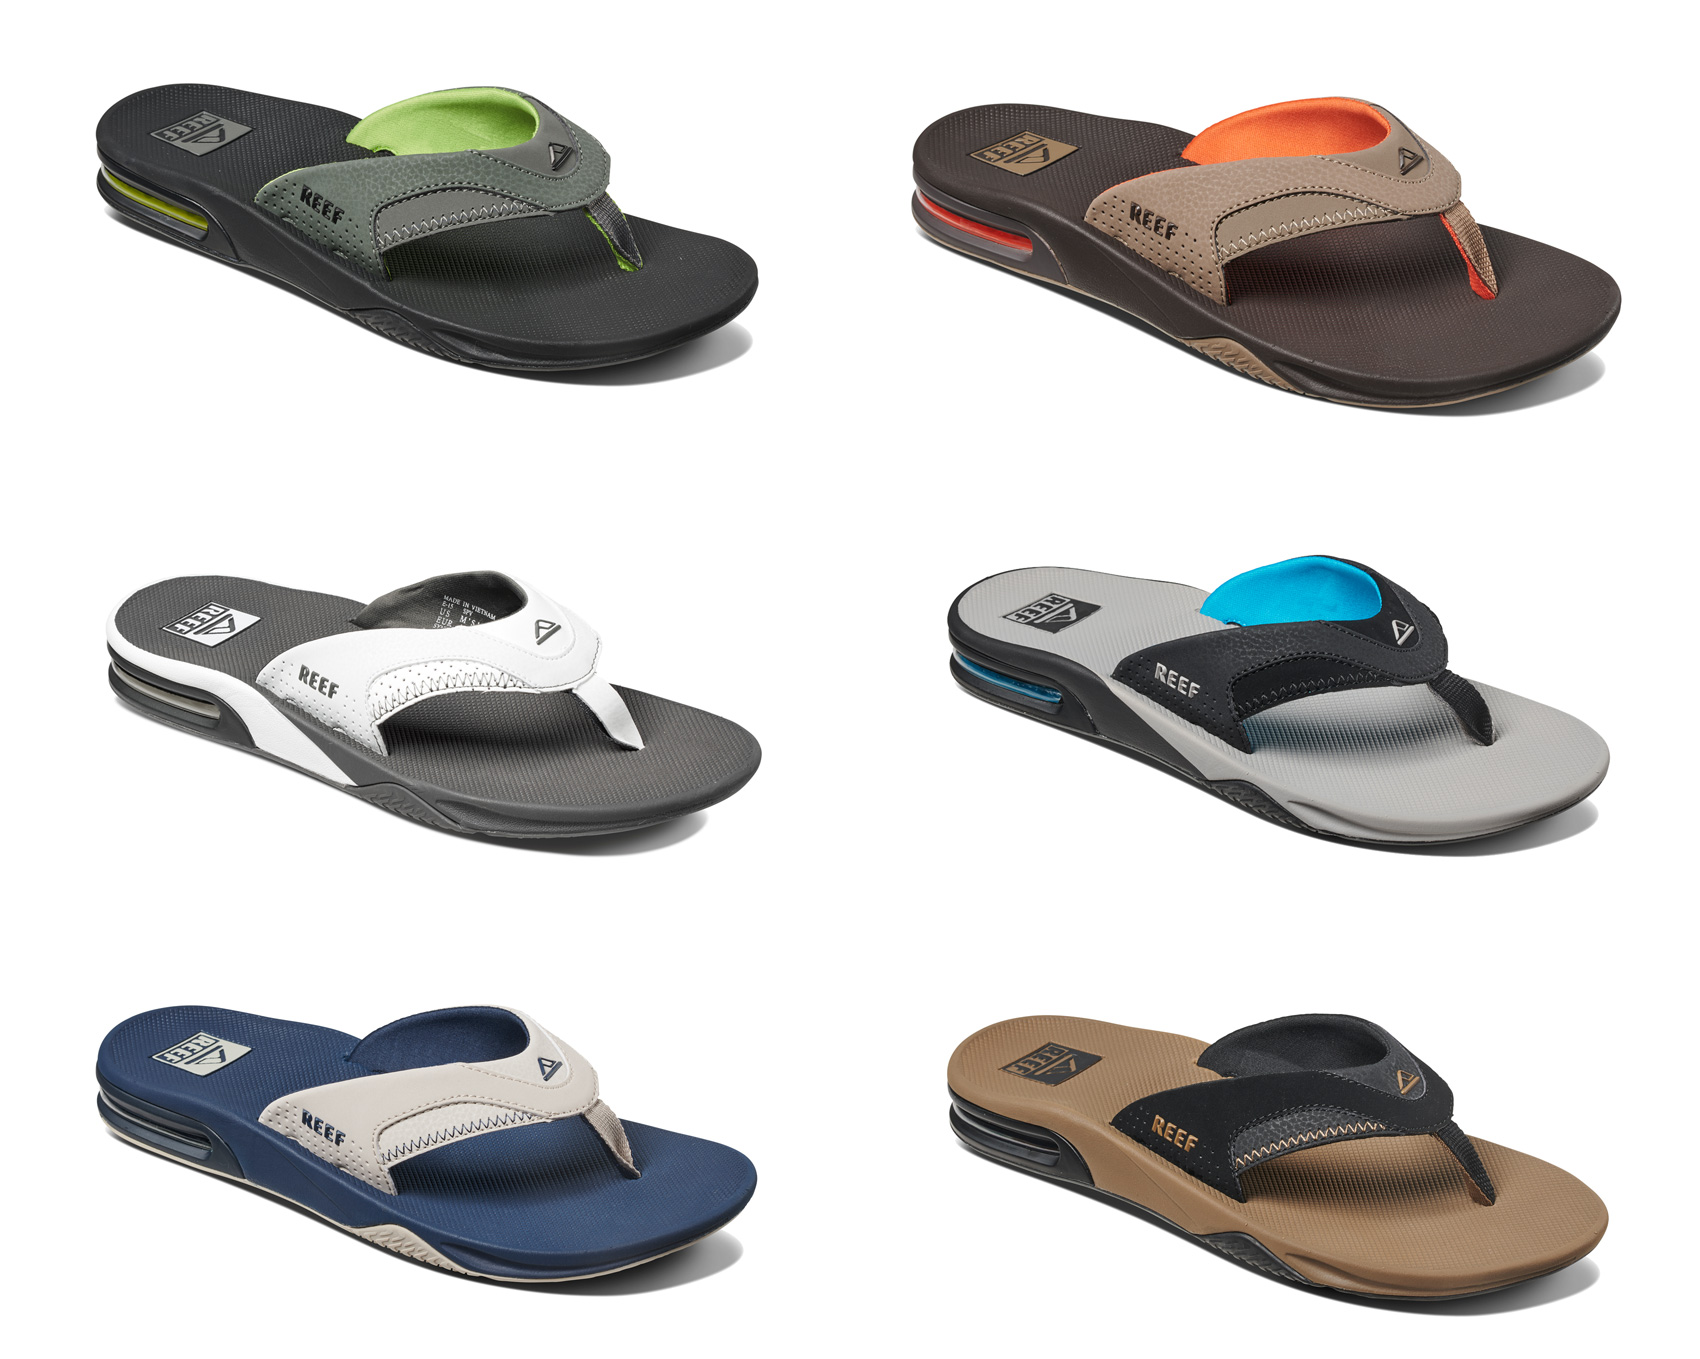 eed0167f7 Sentinel Reef Flip Flops - Fanning - Sandal